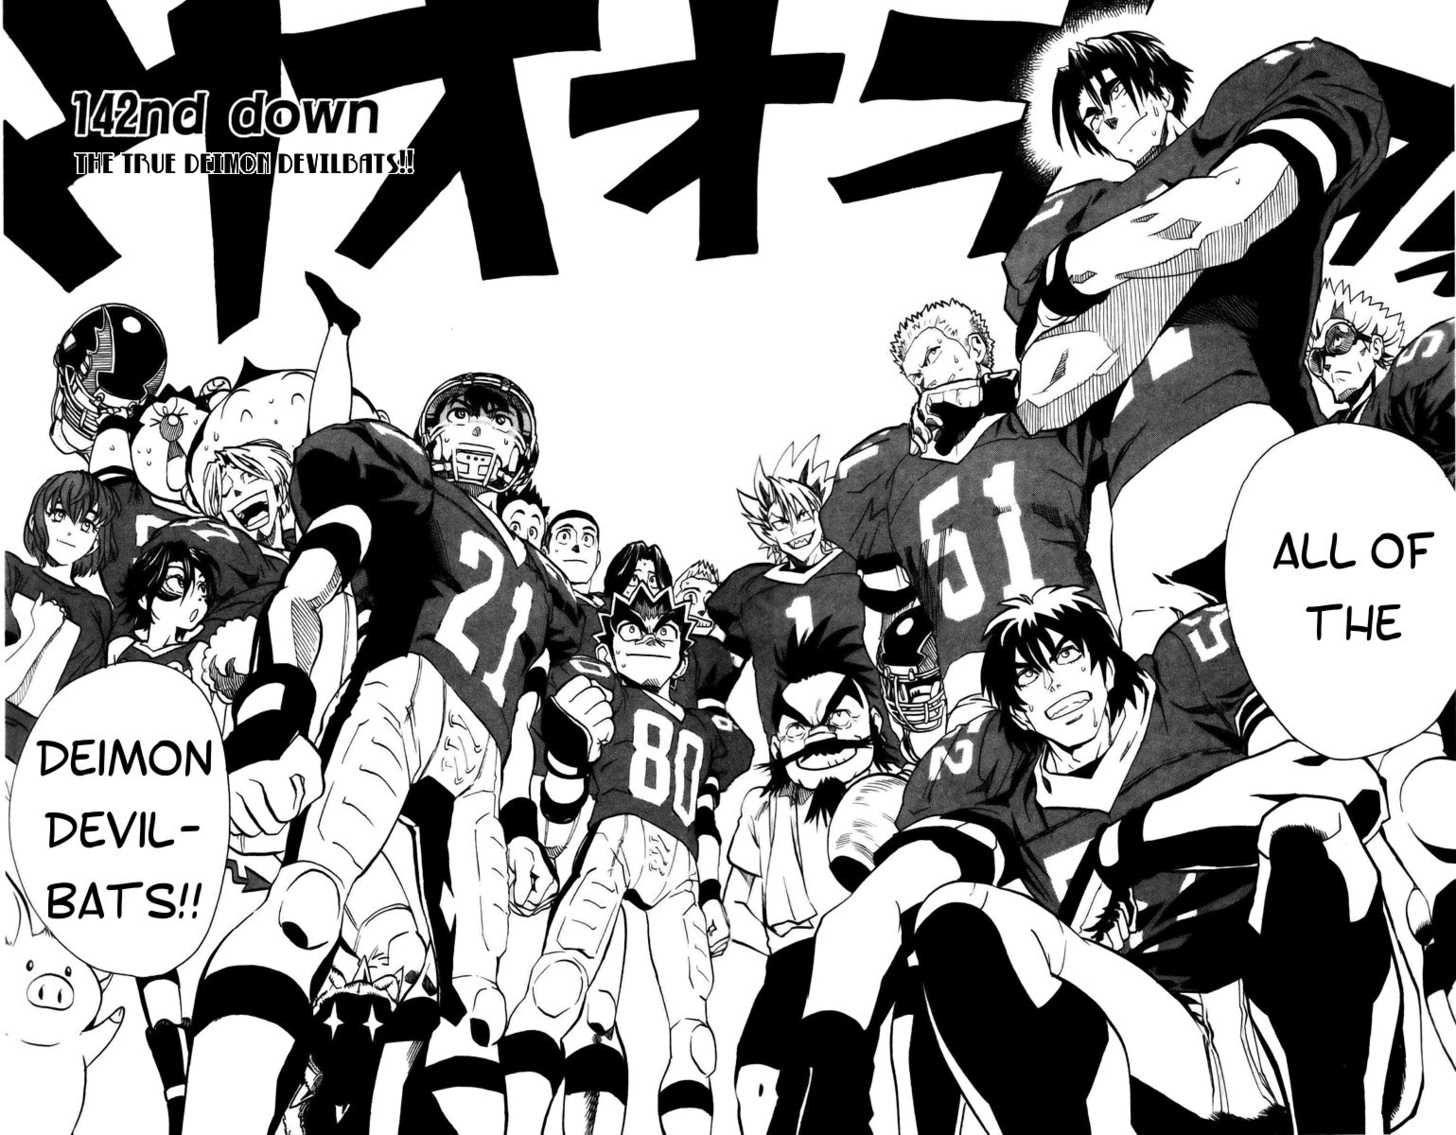 Read Manga Eyeshield 21 Online In High Quality